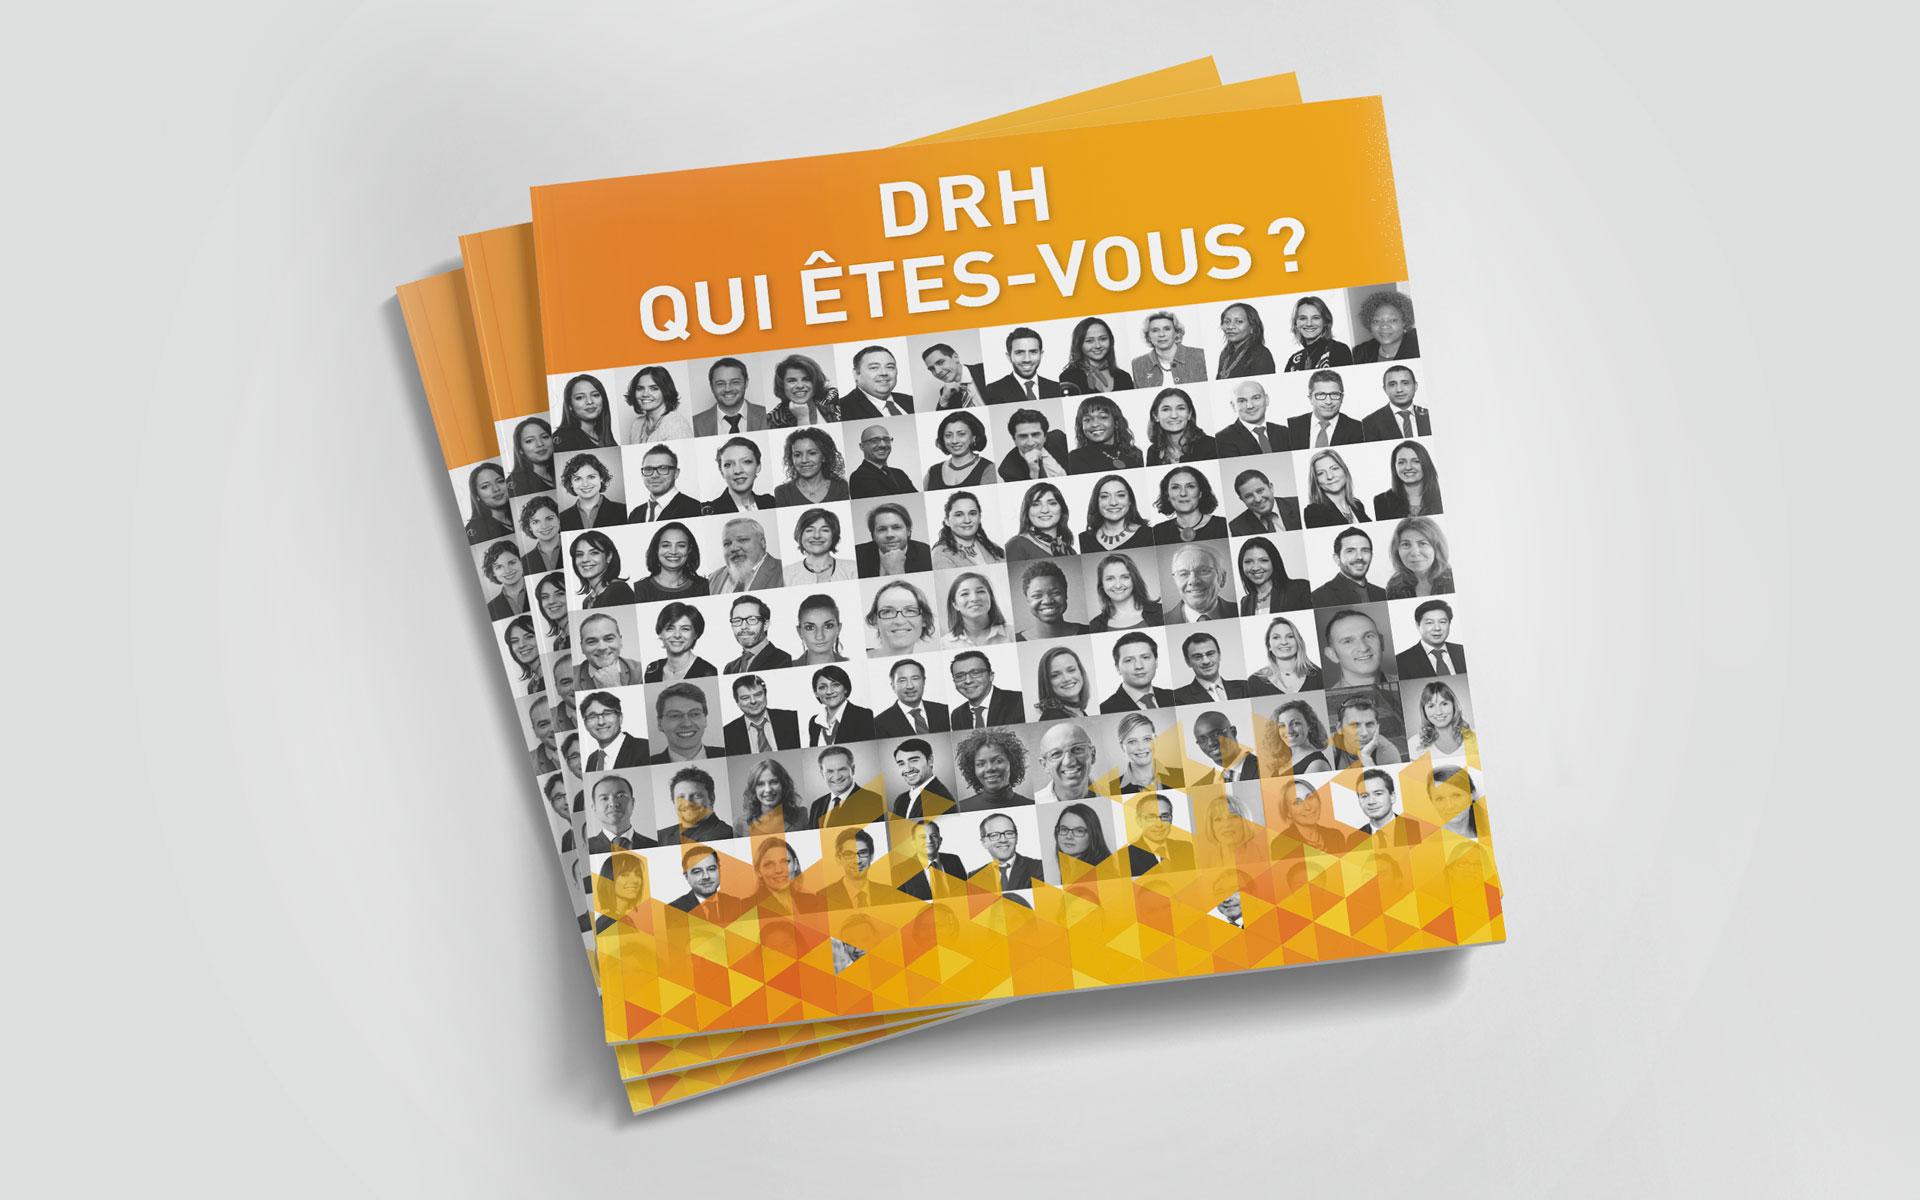 ADP-livre-drh-ferme